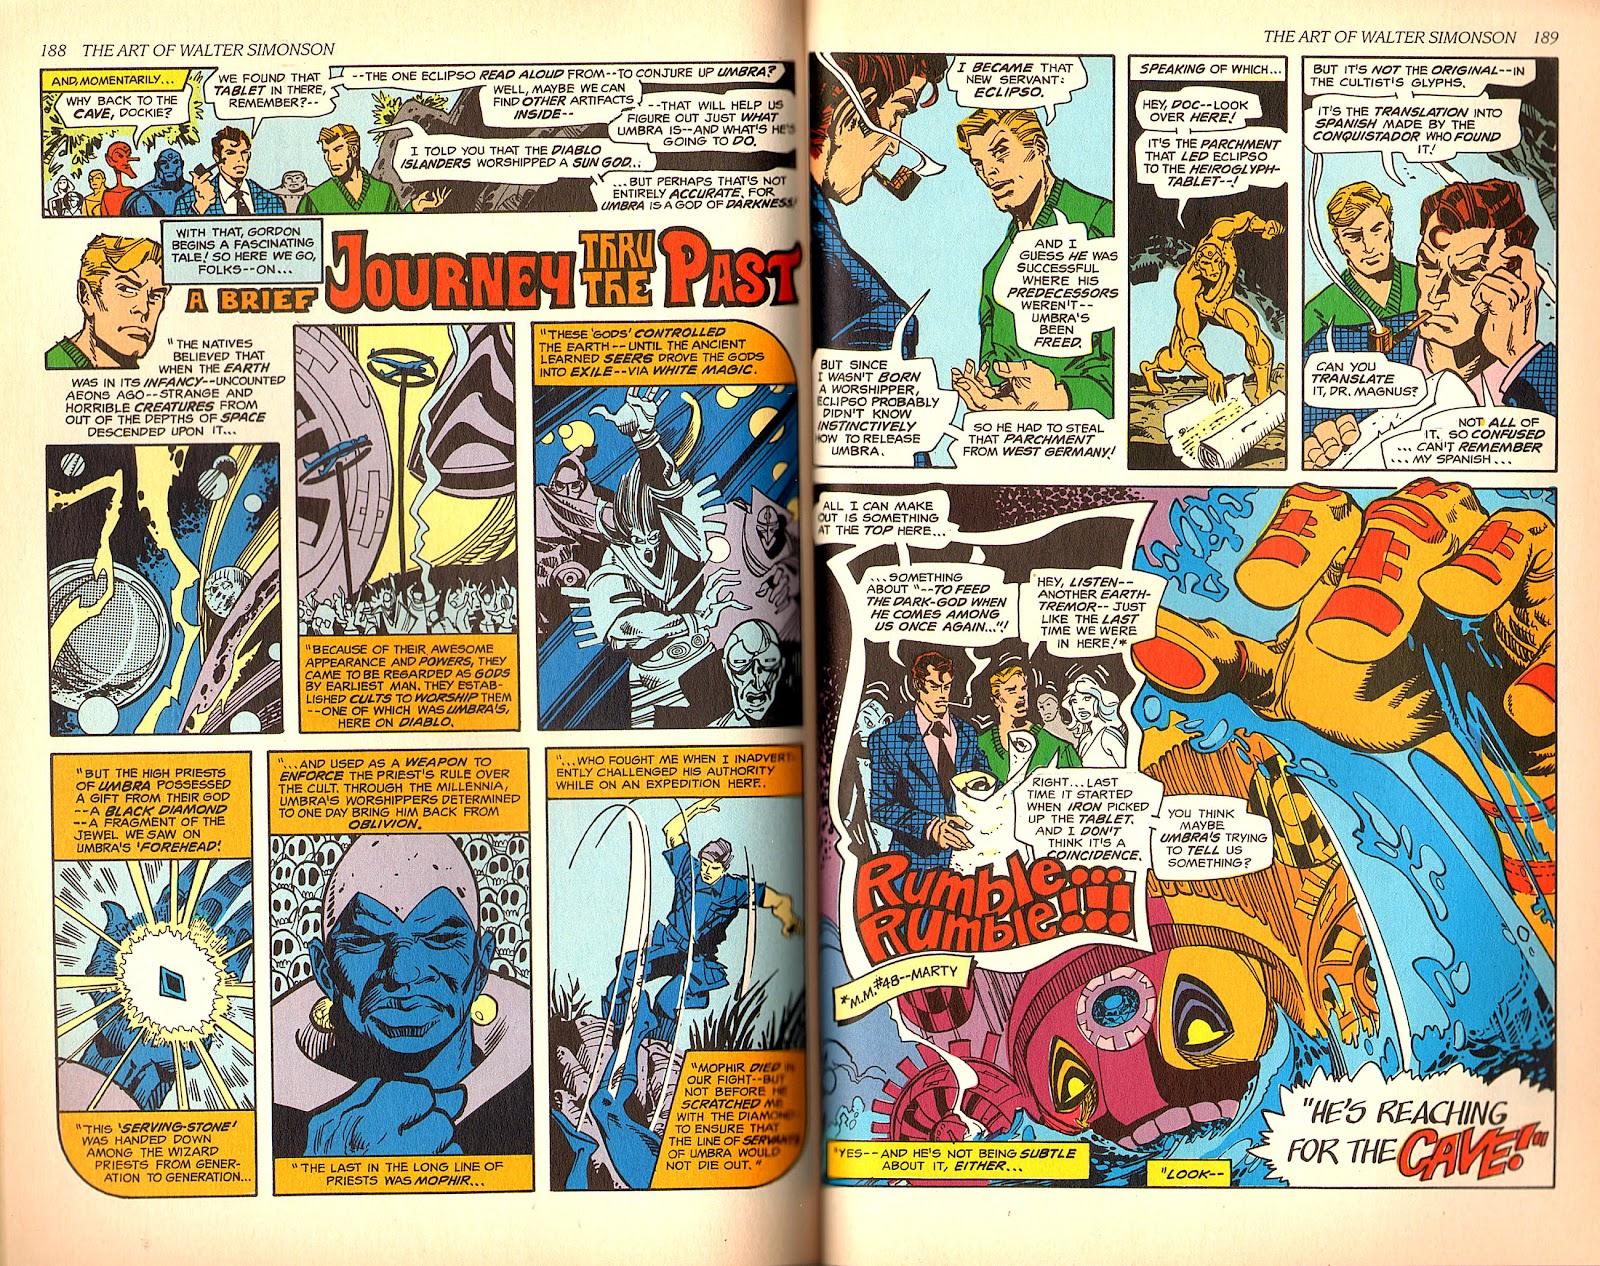 Read online The Art of Walter Simonson comic -  Issue # TPB - 96